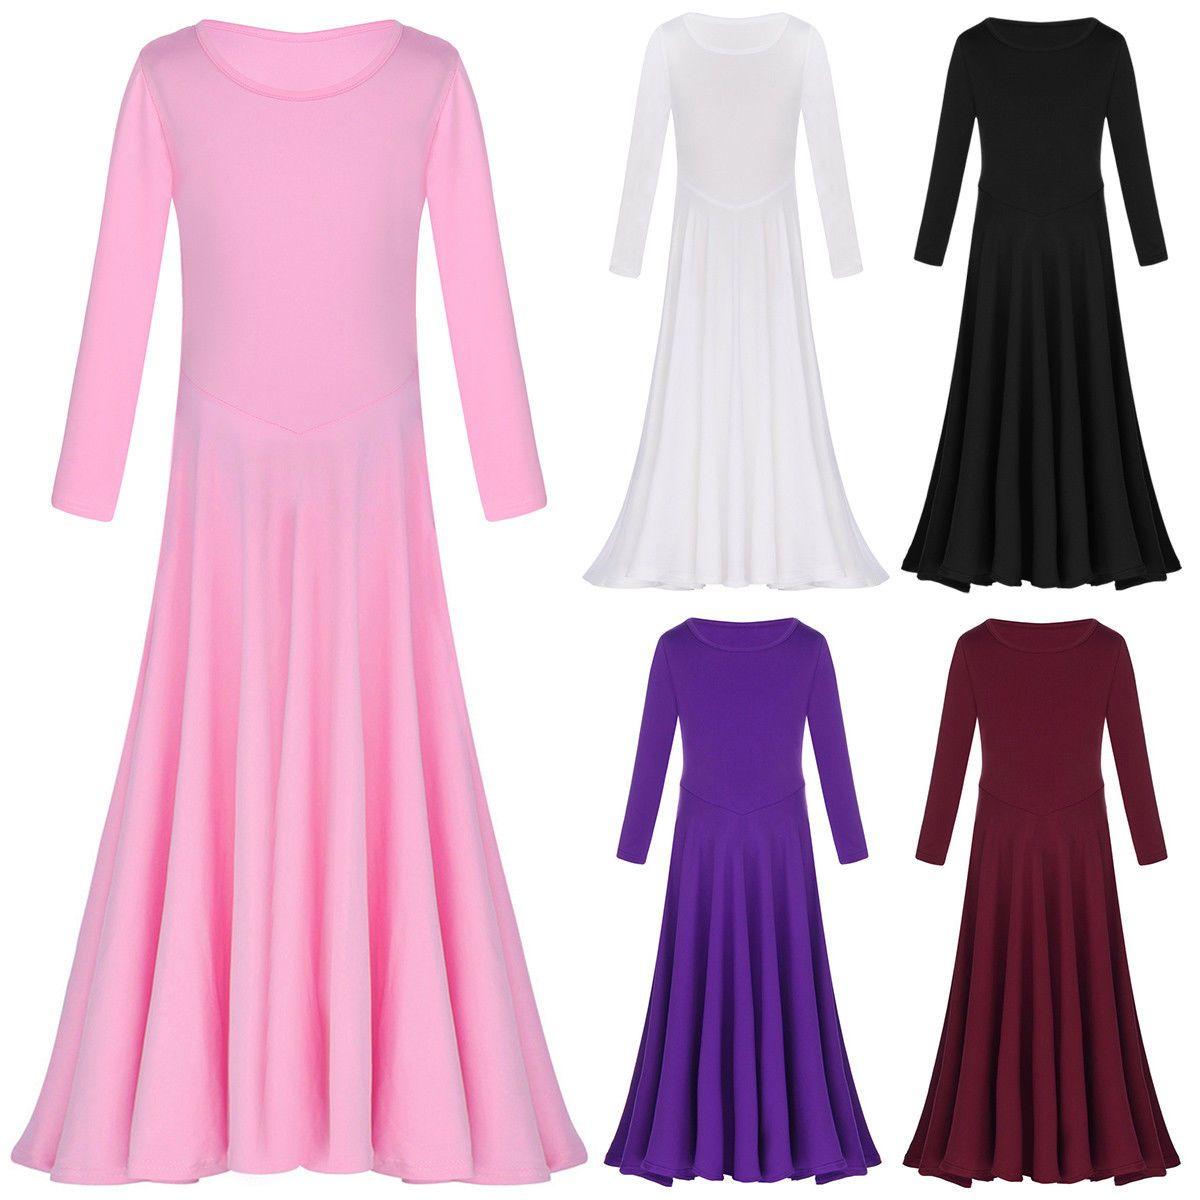 Girls kids praise liturgical dress long sleeve ballet dance costume